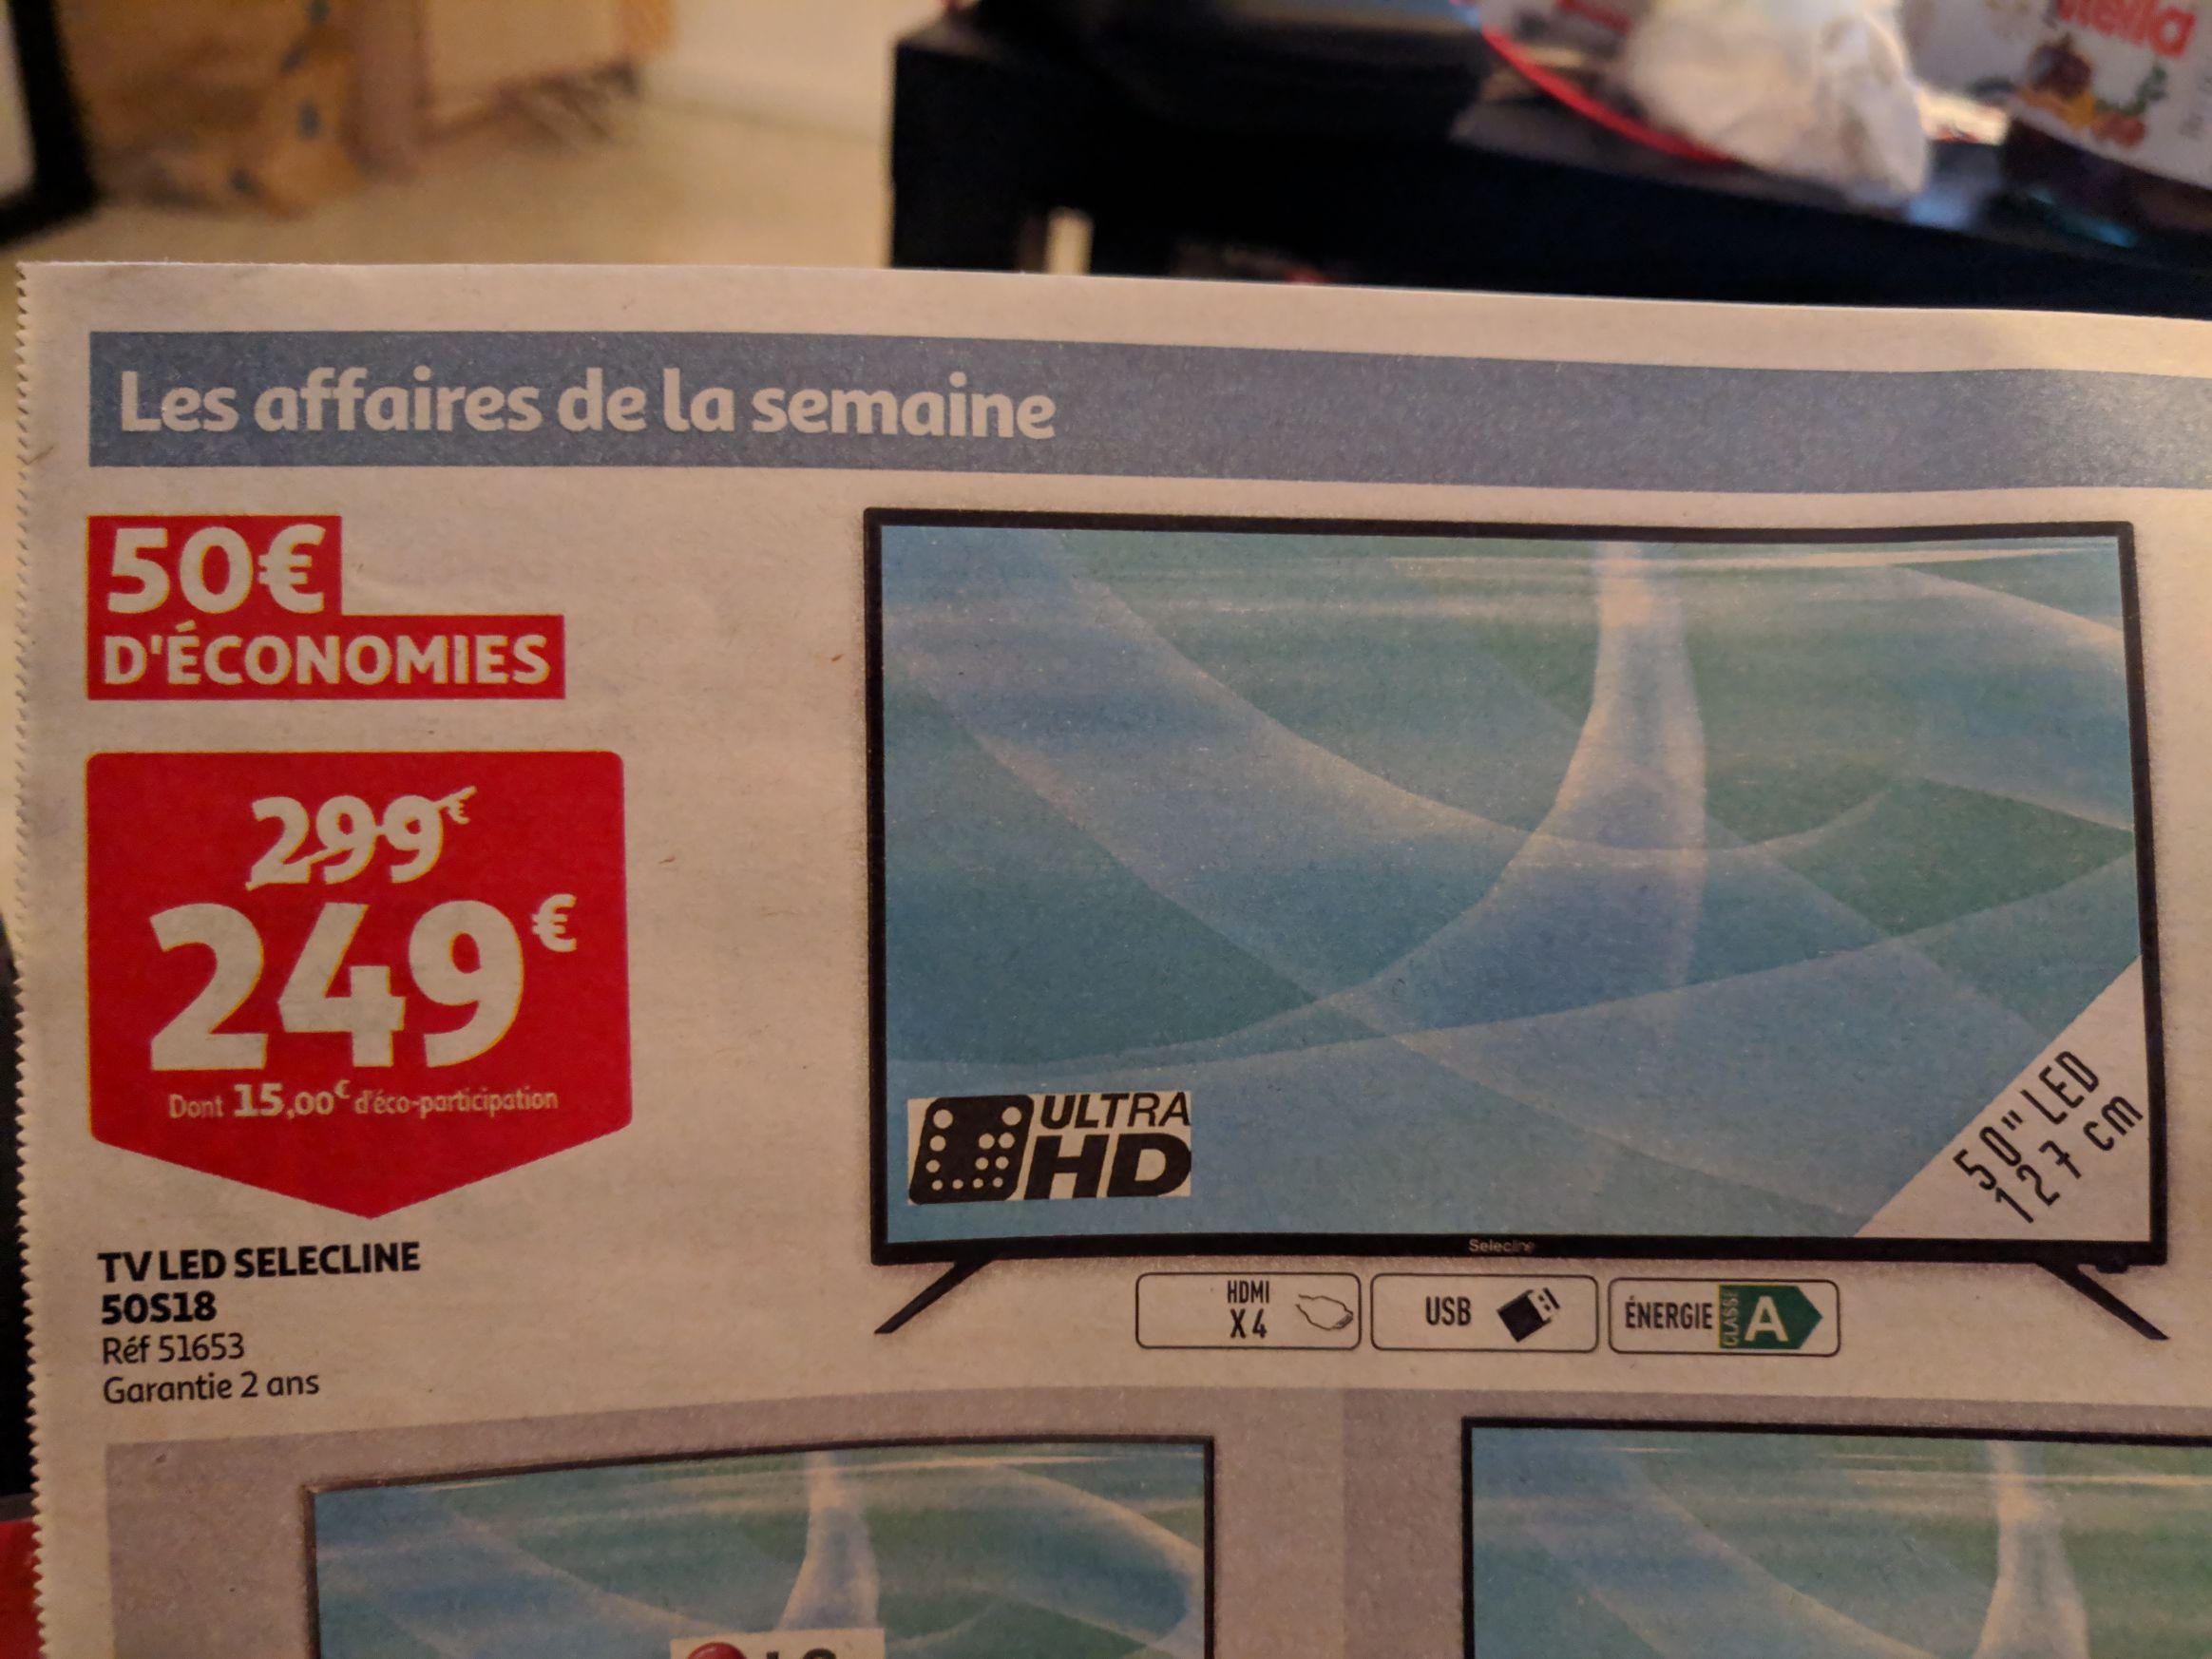 "TV LED 50"" Selecline 50S18 - UHD"